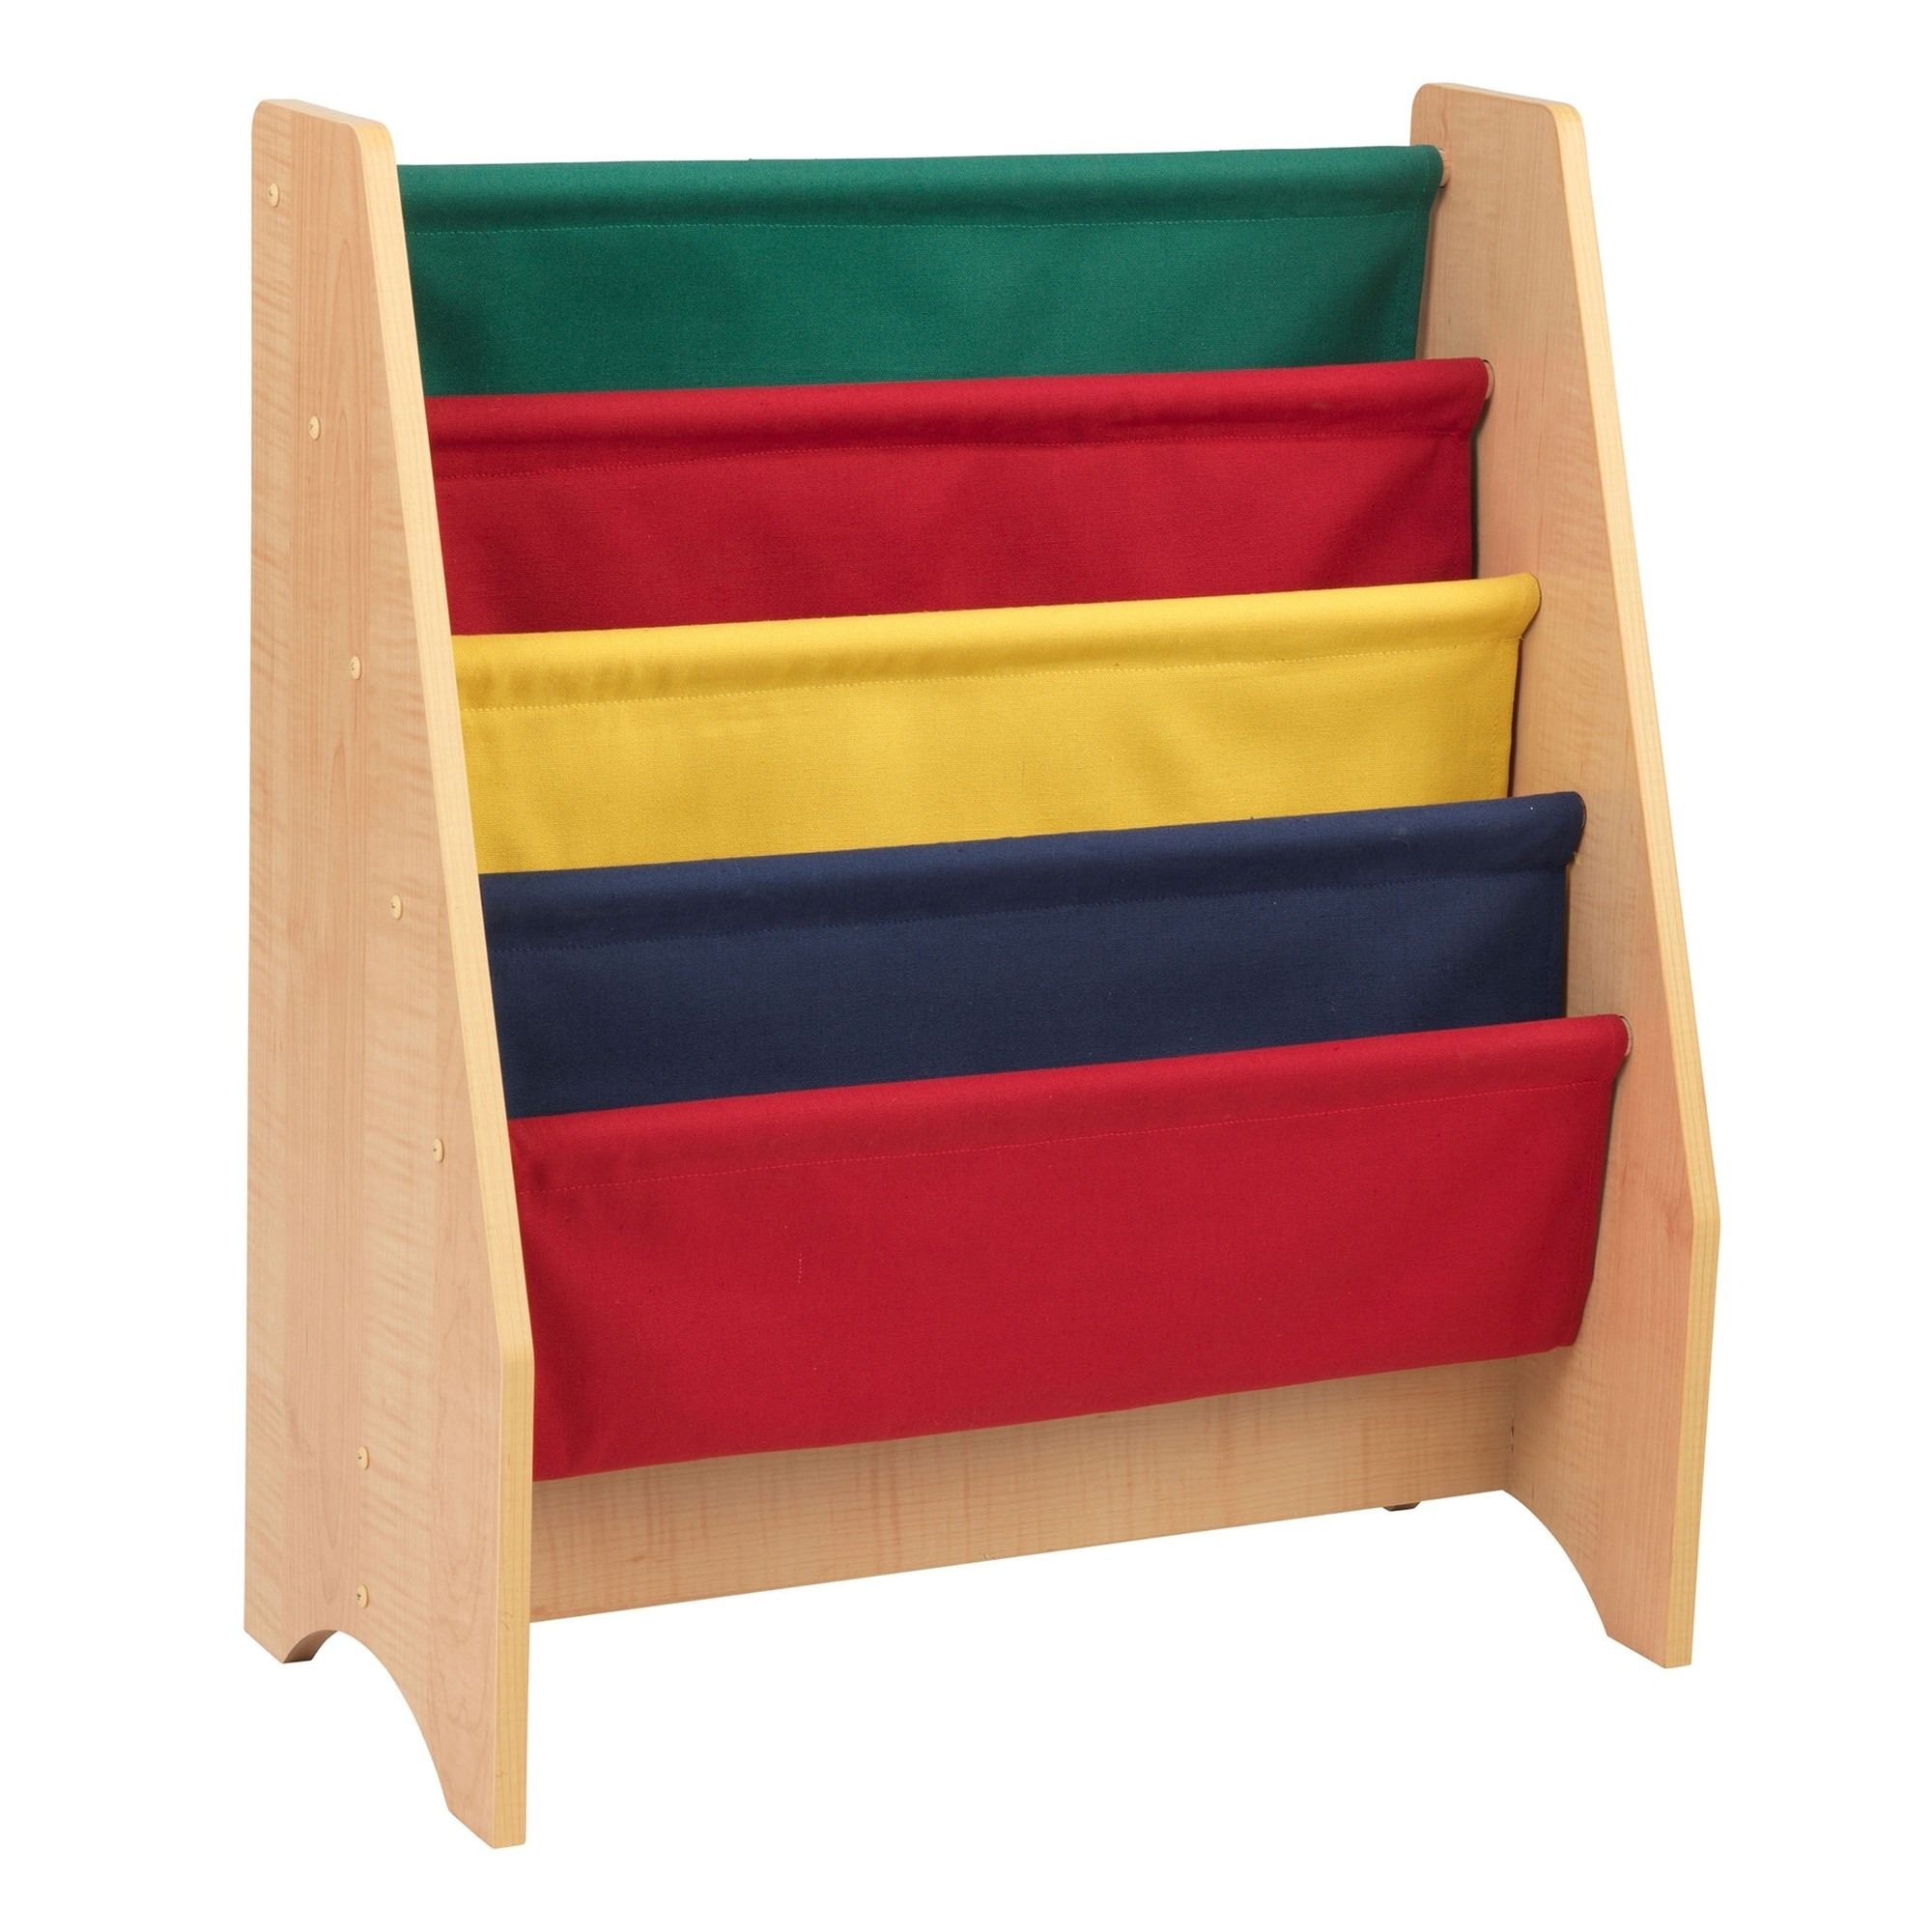 Kidkraft Sling Bookshelf- Primary